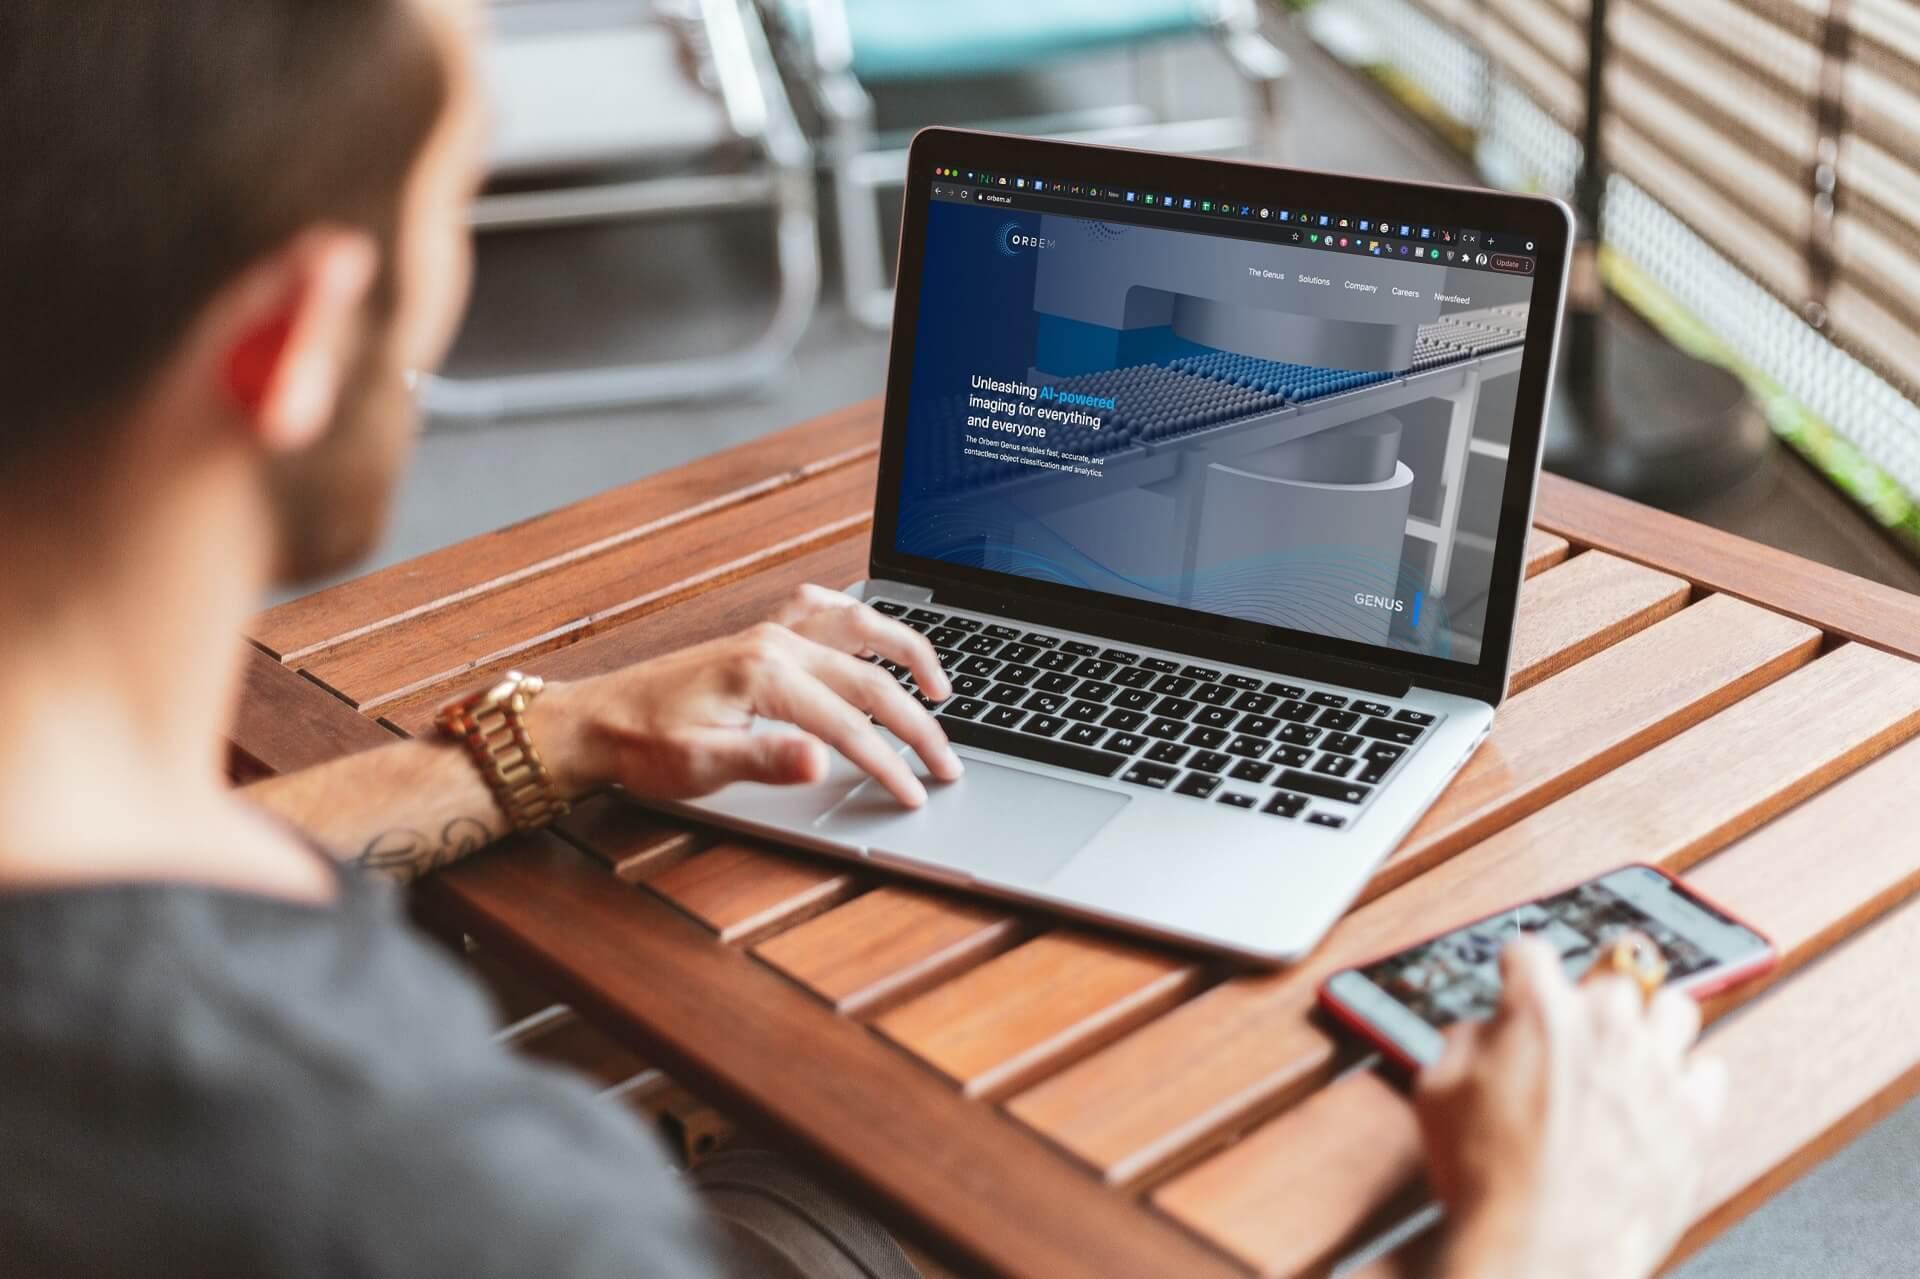 Orbem website on a laptop